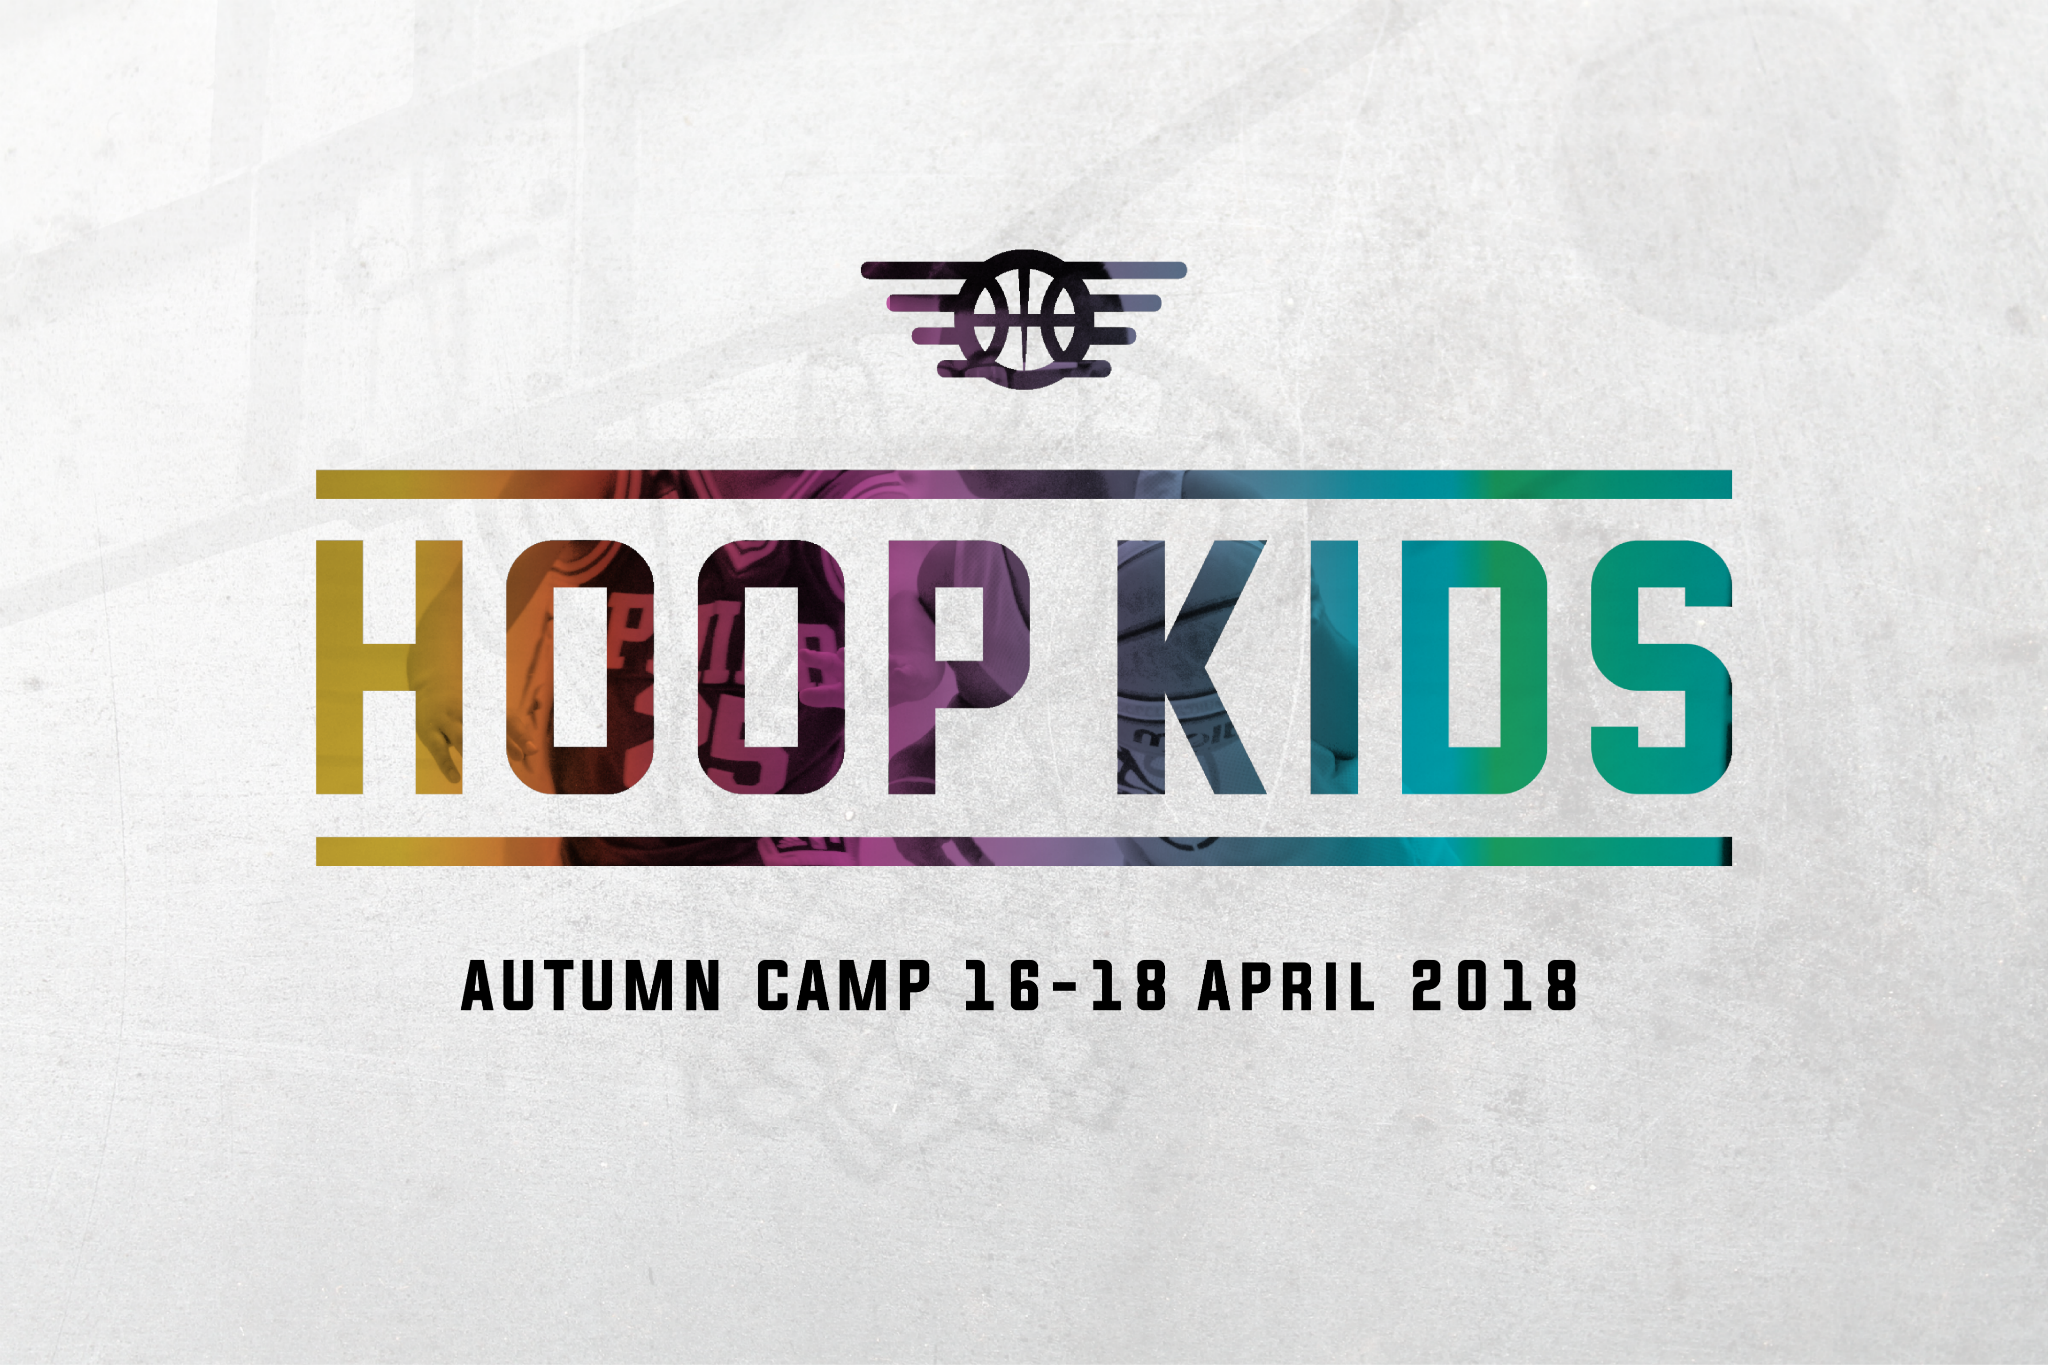 Hoop Kids Autumn Camp 2018